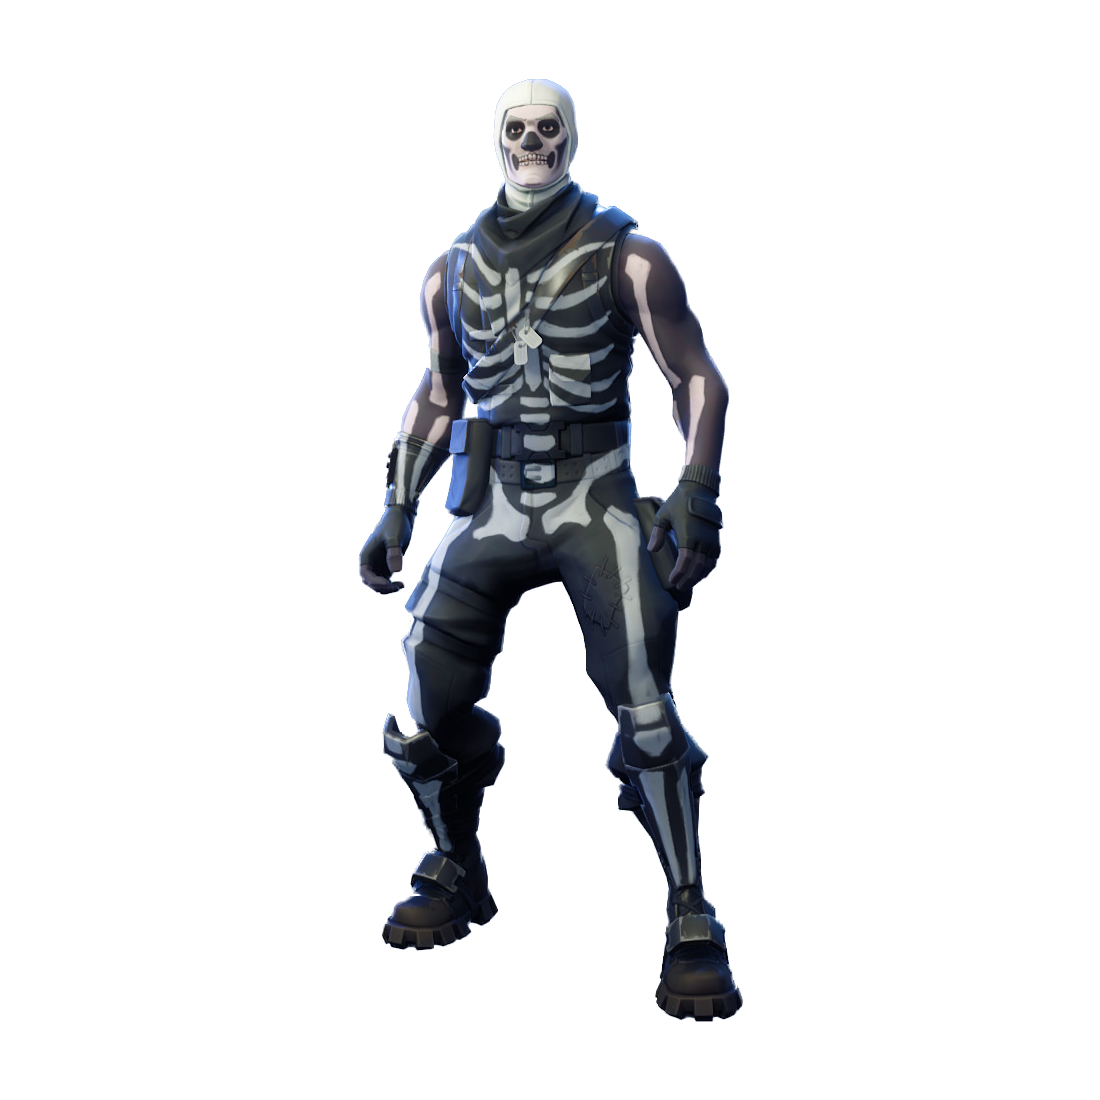 Fortnite Skull Trooper PNG Image.